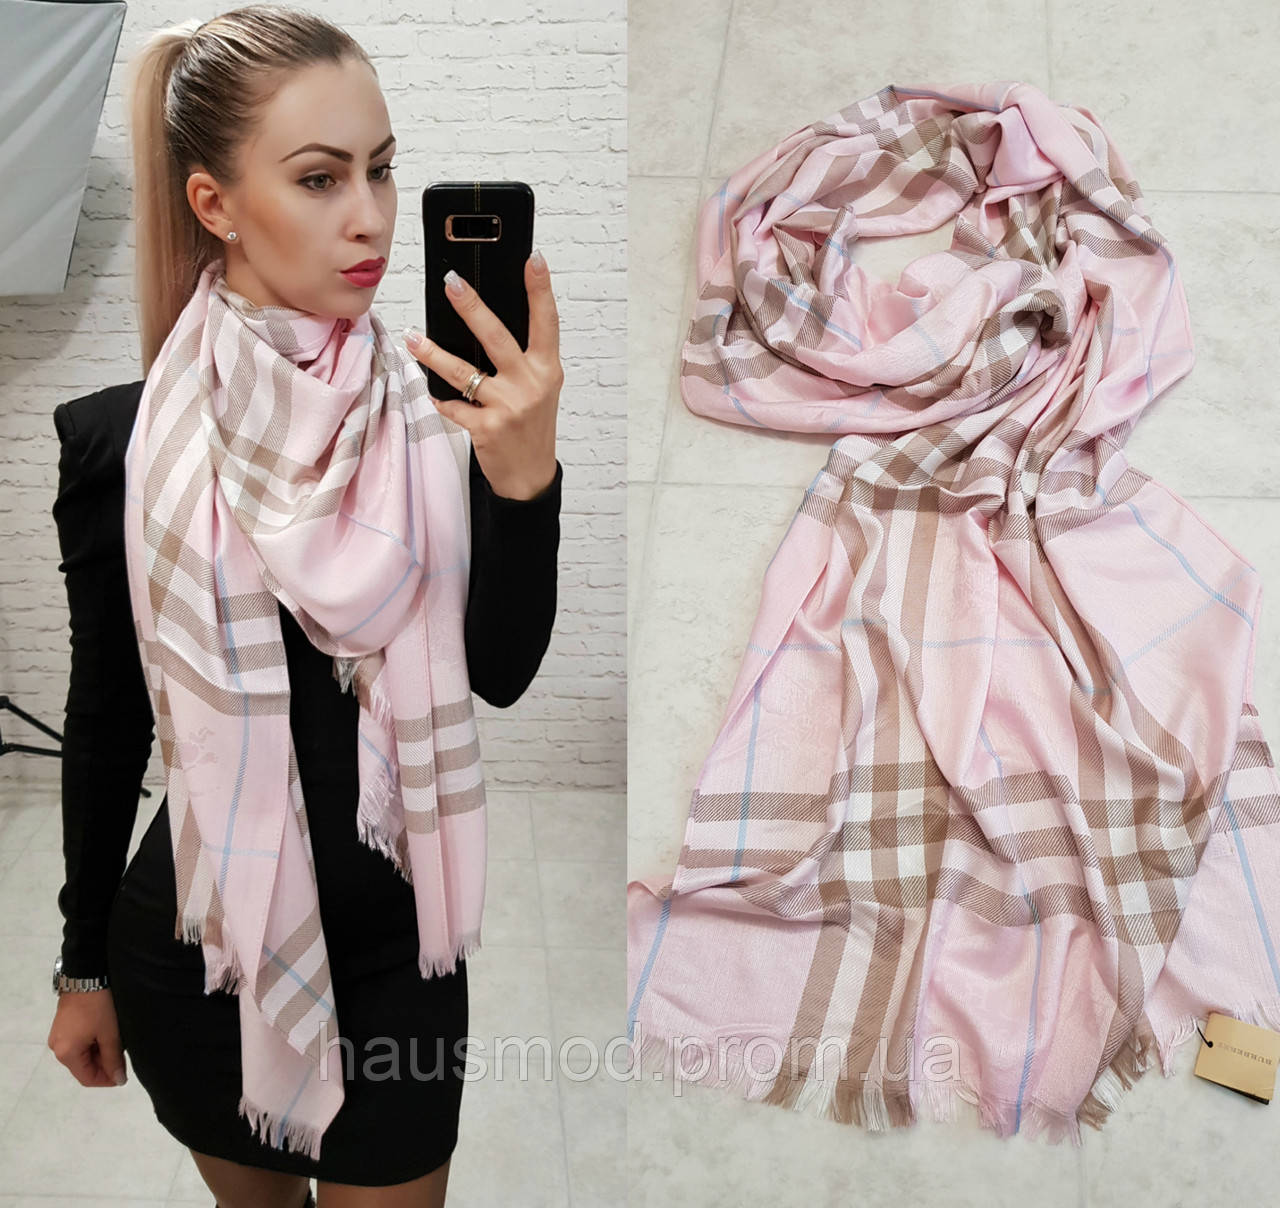 Палантин шарф брендовый реплика Burberry пудра